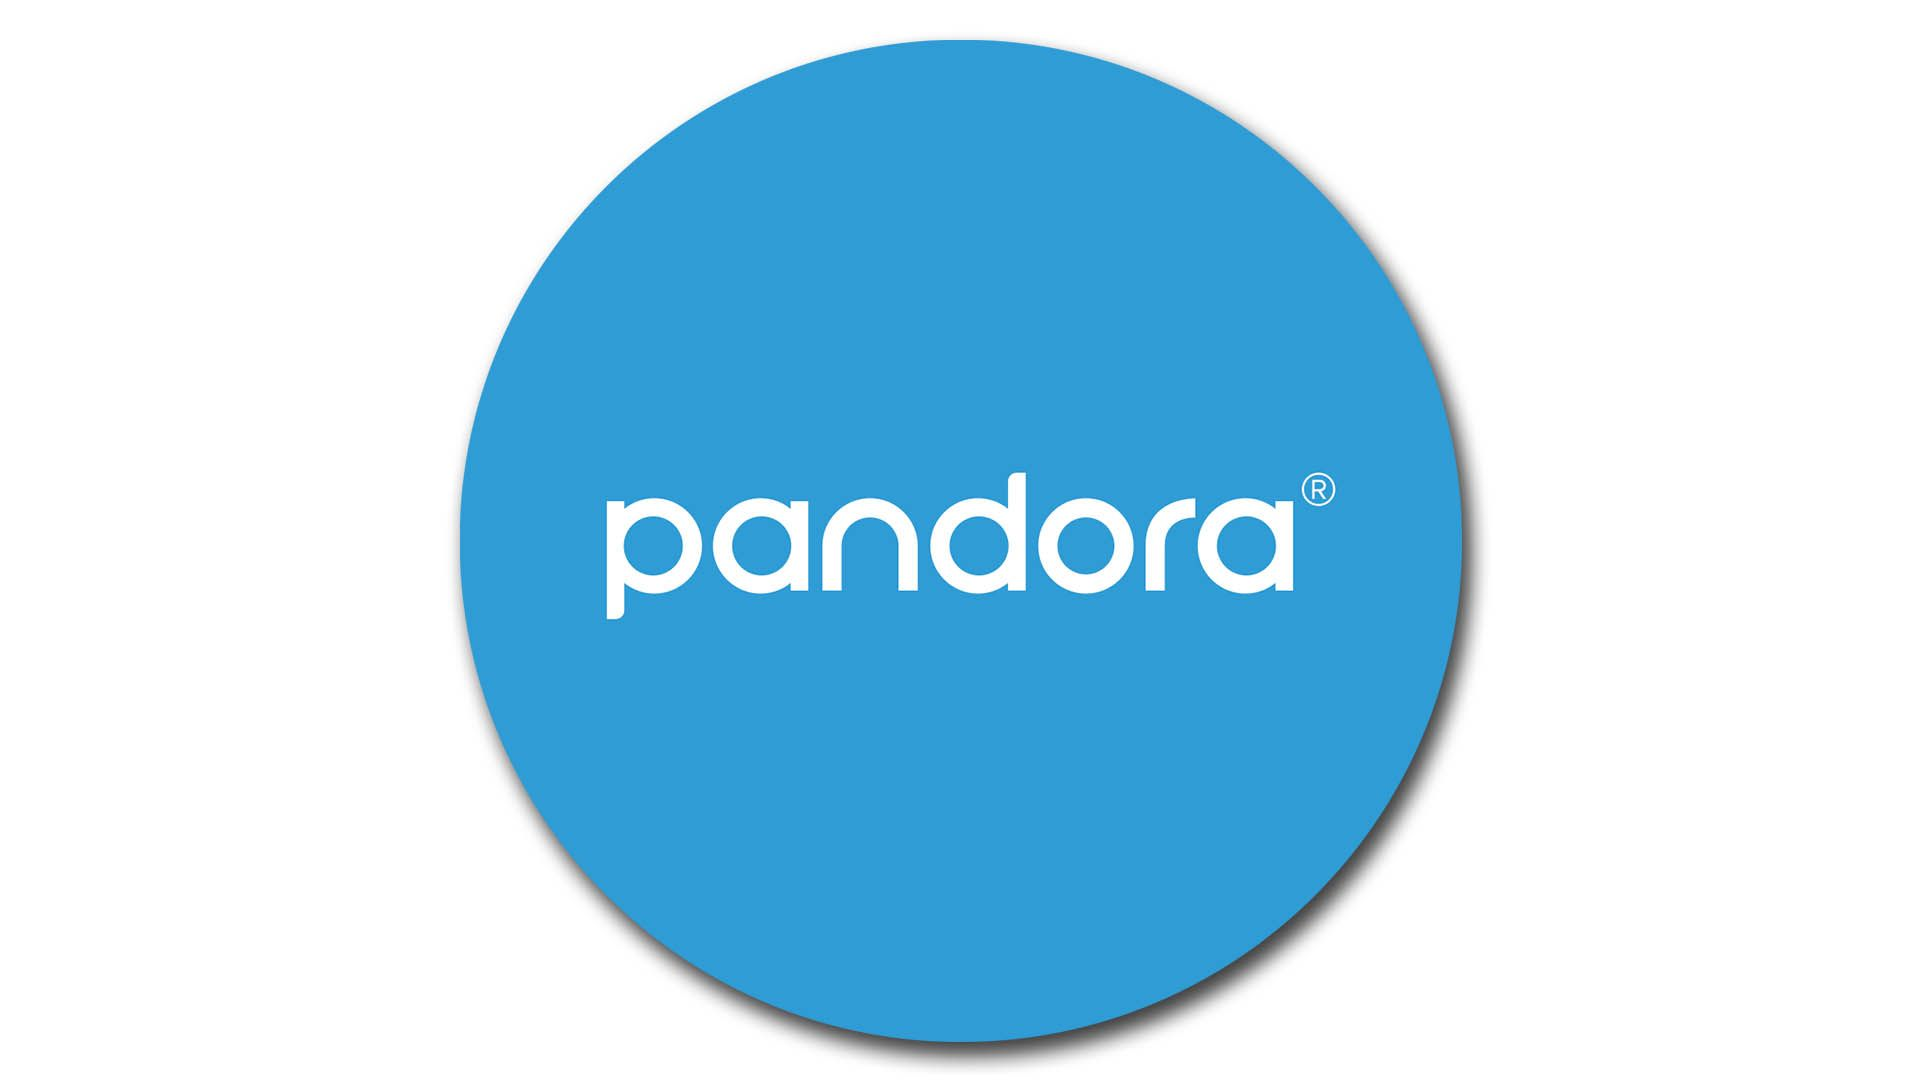 De moins 1,5 million de dollars, à plus 2,6 milliards de dollars #GrowthHacking #WEbMarketing #FormationGrowthHacking #CentreDeFormationFrance #TunnelAARRR #AARRR #SocialMedia #CommunityManagement #SEO #Pandora #PandoraRadio #acquisition